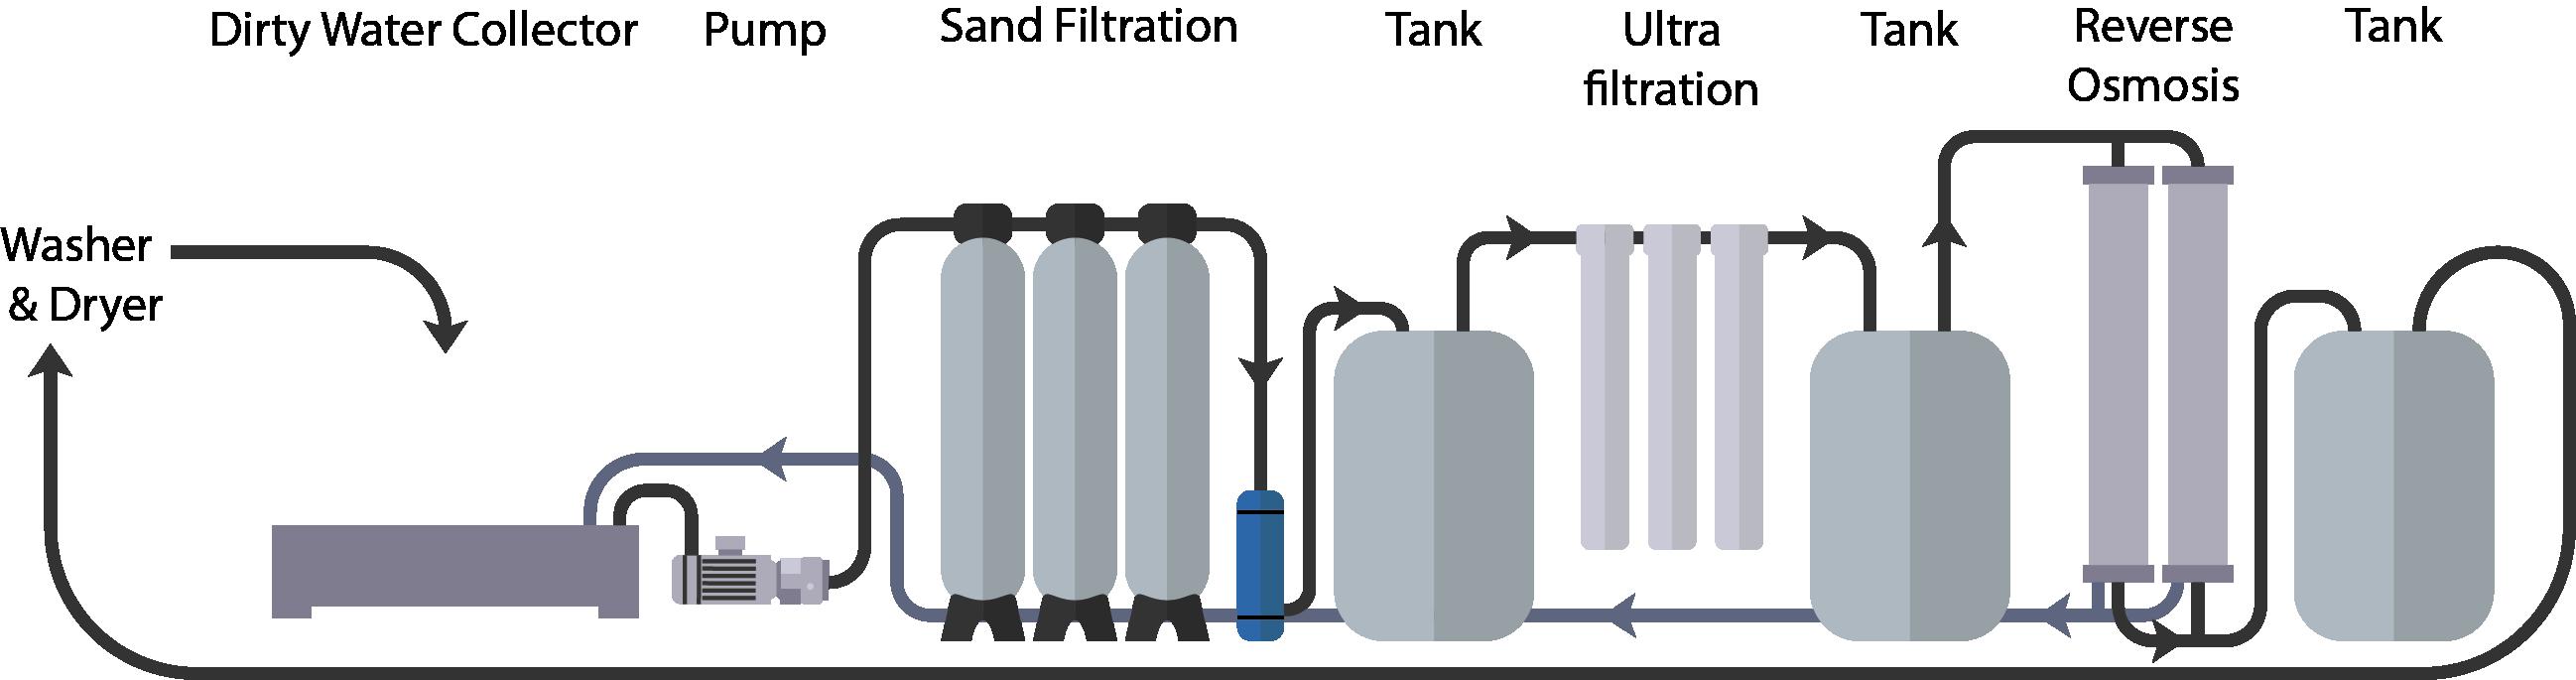 Water Filtration Process Sketch Cs6 Trashpresso By Miniwiz